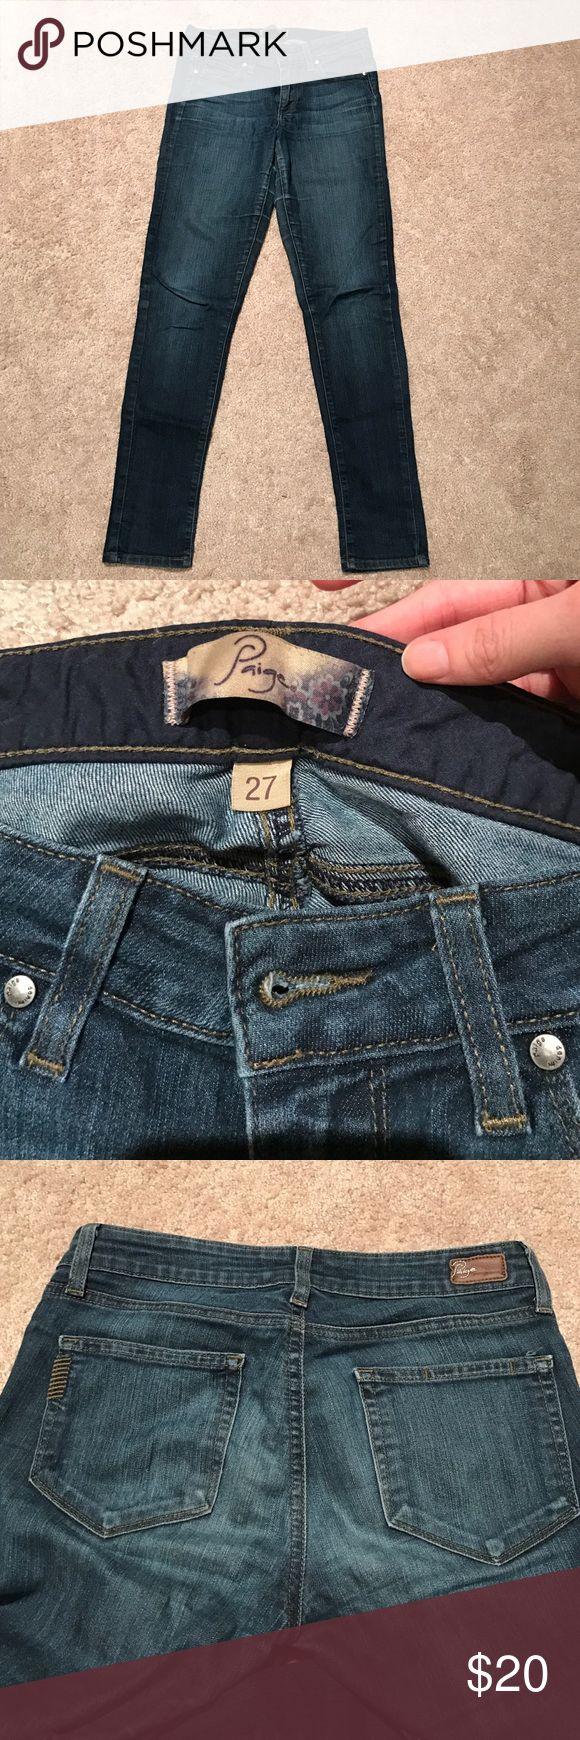 Paige Premium Denim Dark Wash Skinnies Still look great but worn. Small hole where inner thighs touch. Super dark wash Paige Jeans Jeans Skinny